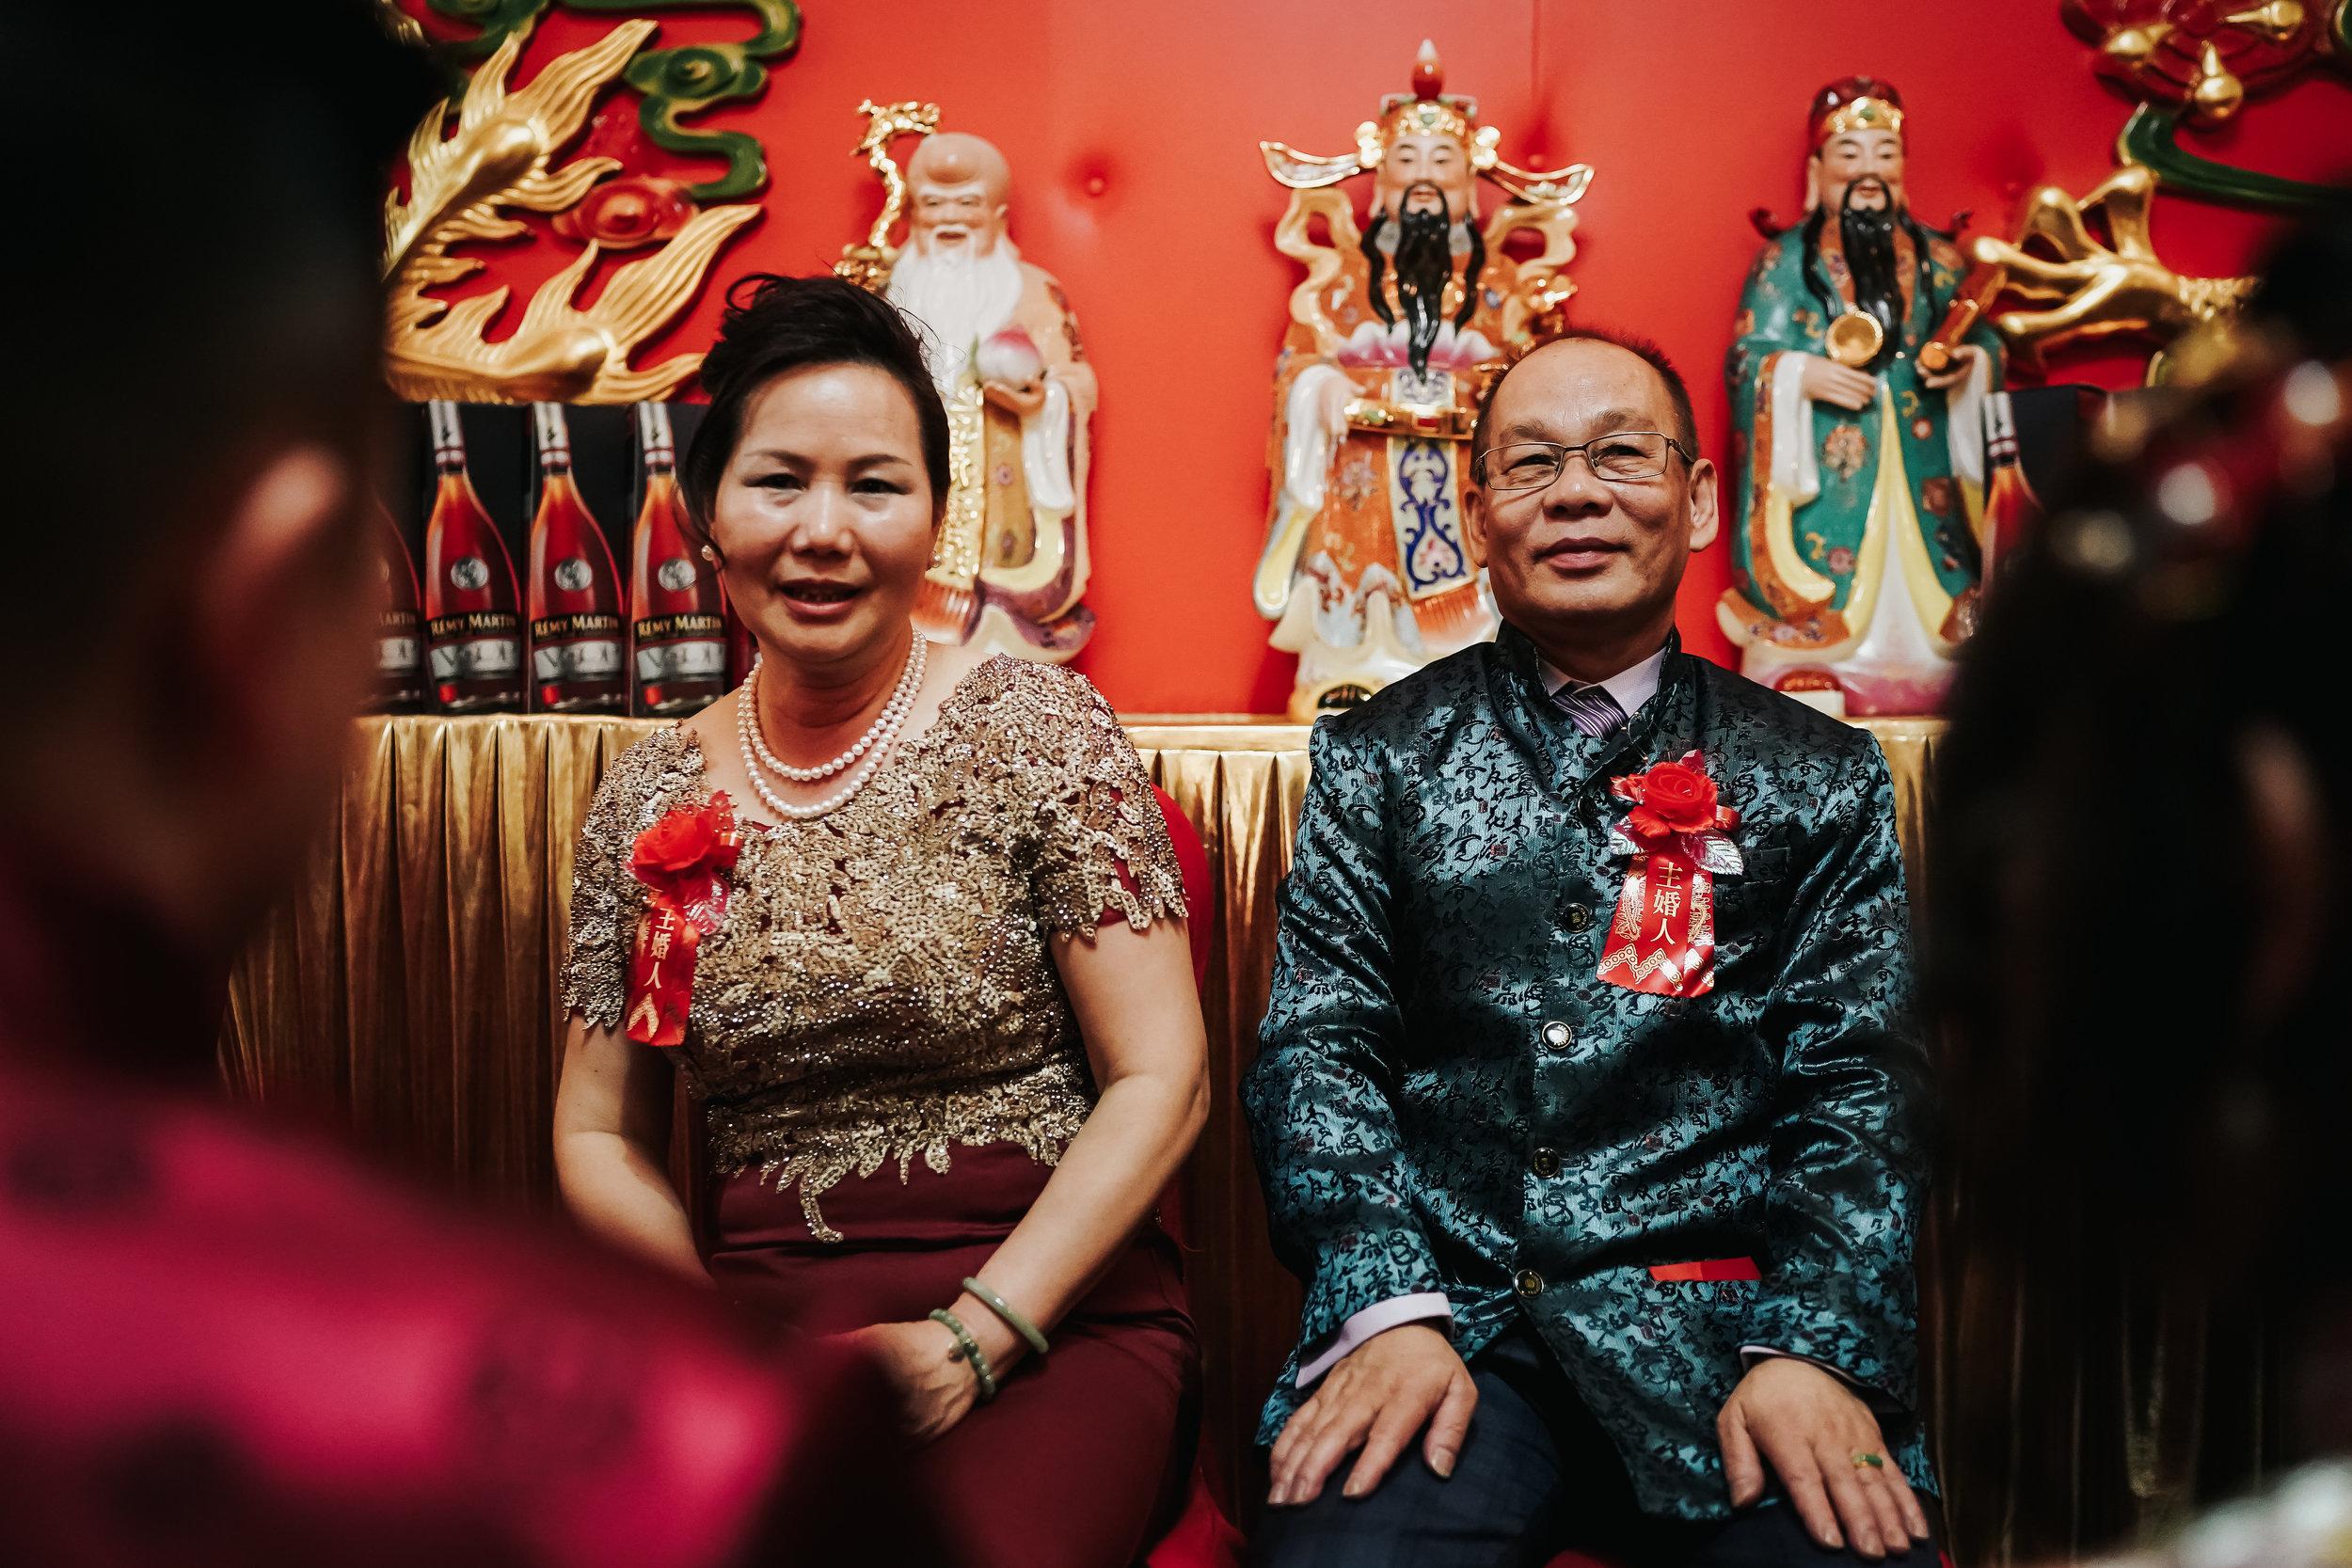 Chinese Wedding Photography Manchester wedding photographer Cheshire - 037.jpg